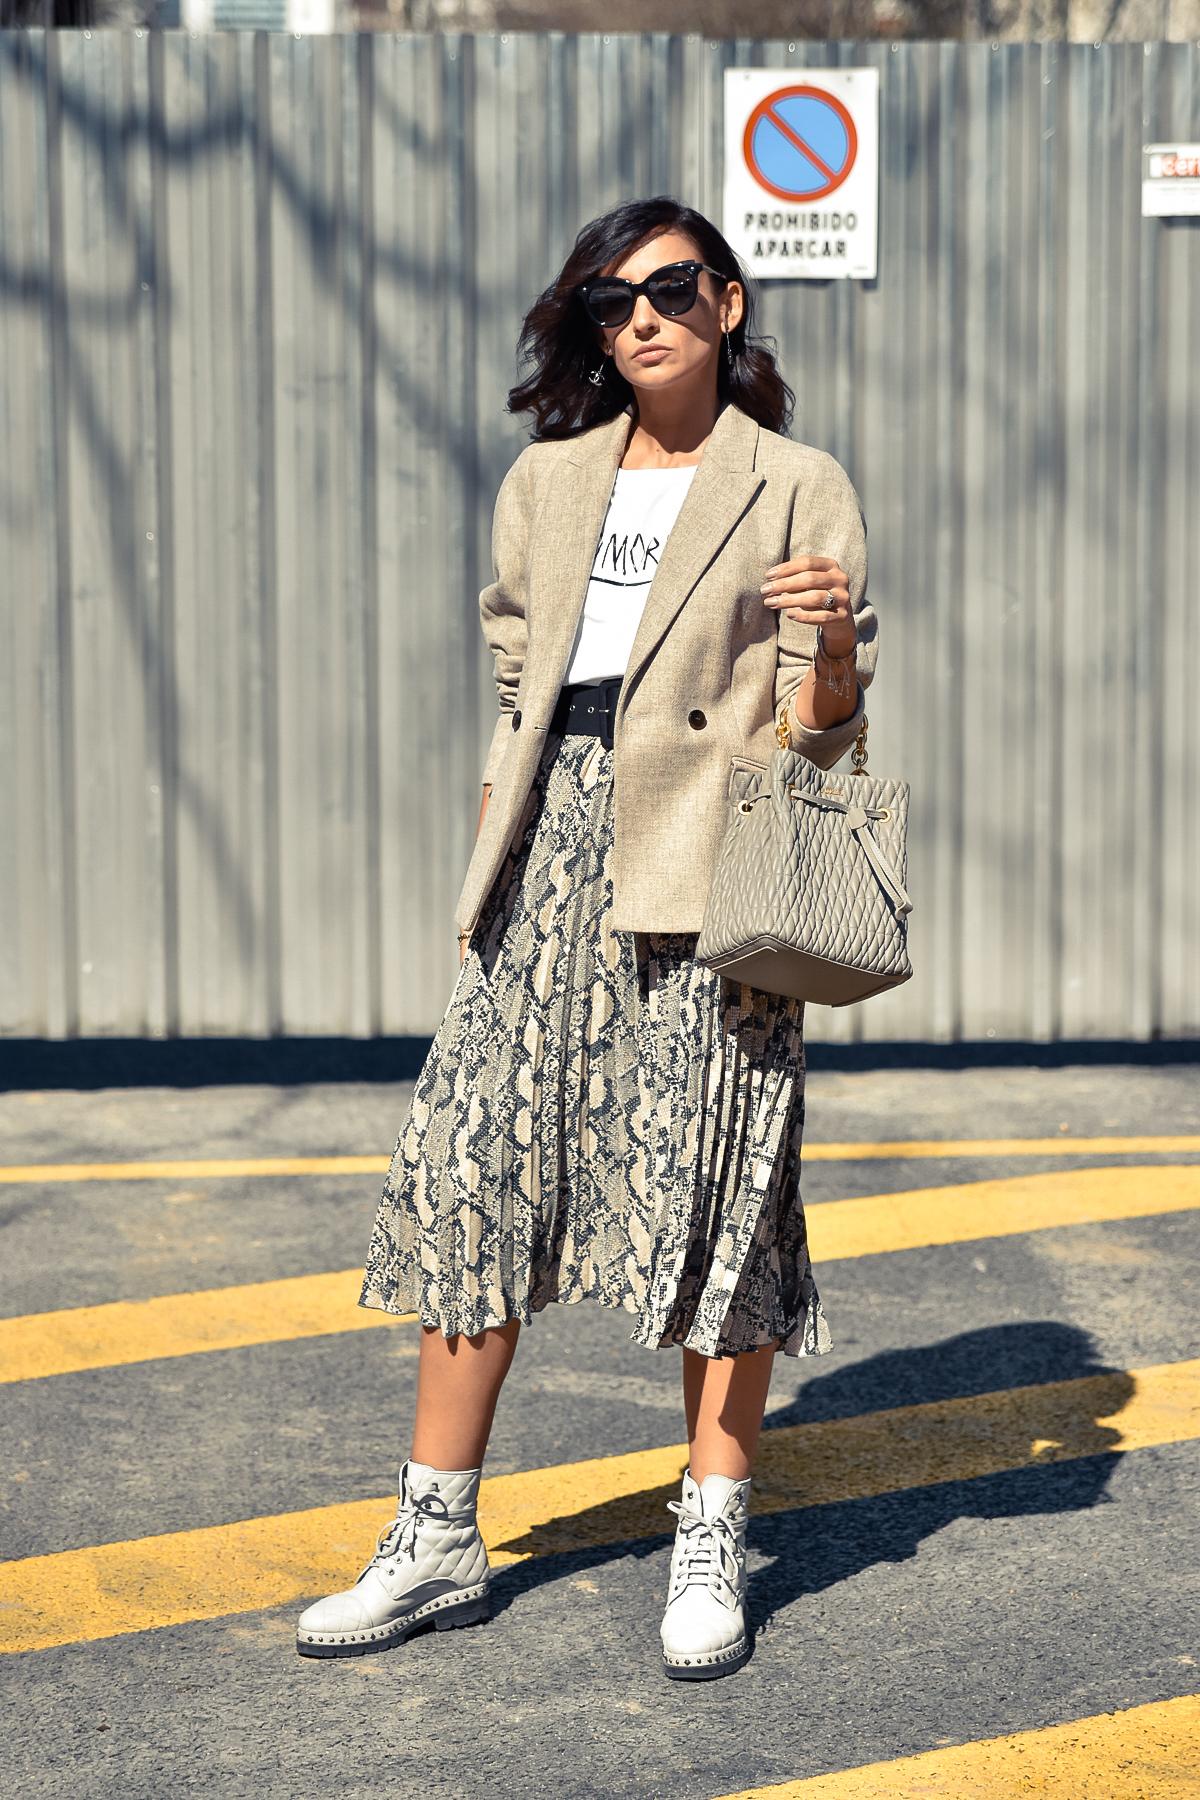 el-blog-de-silvia-look-falda-animal-print-balzer-01